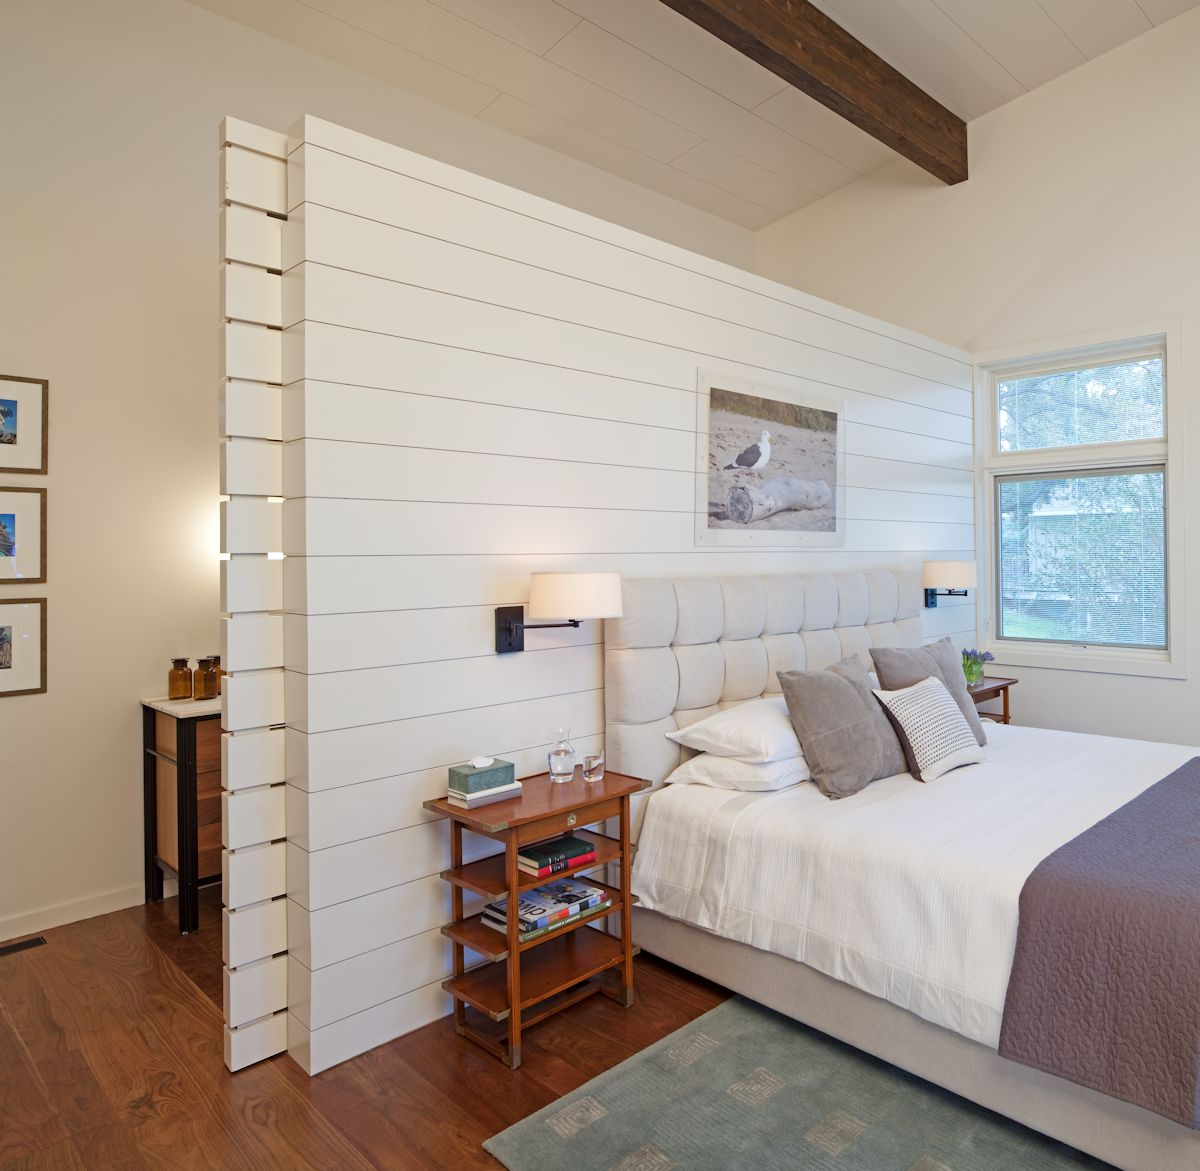 Bedroom, Bathroom, Weekend Retreat in Marble Falls, Texas